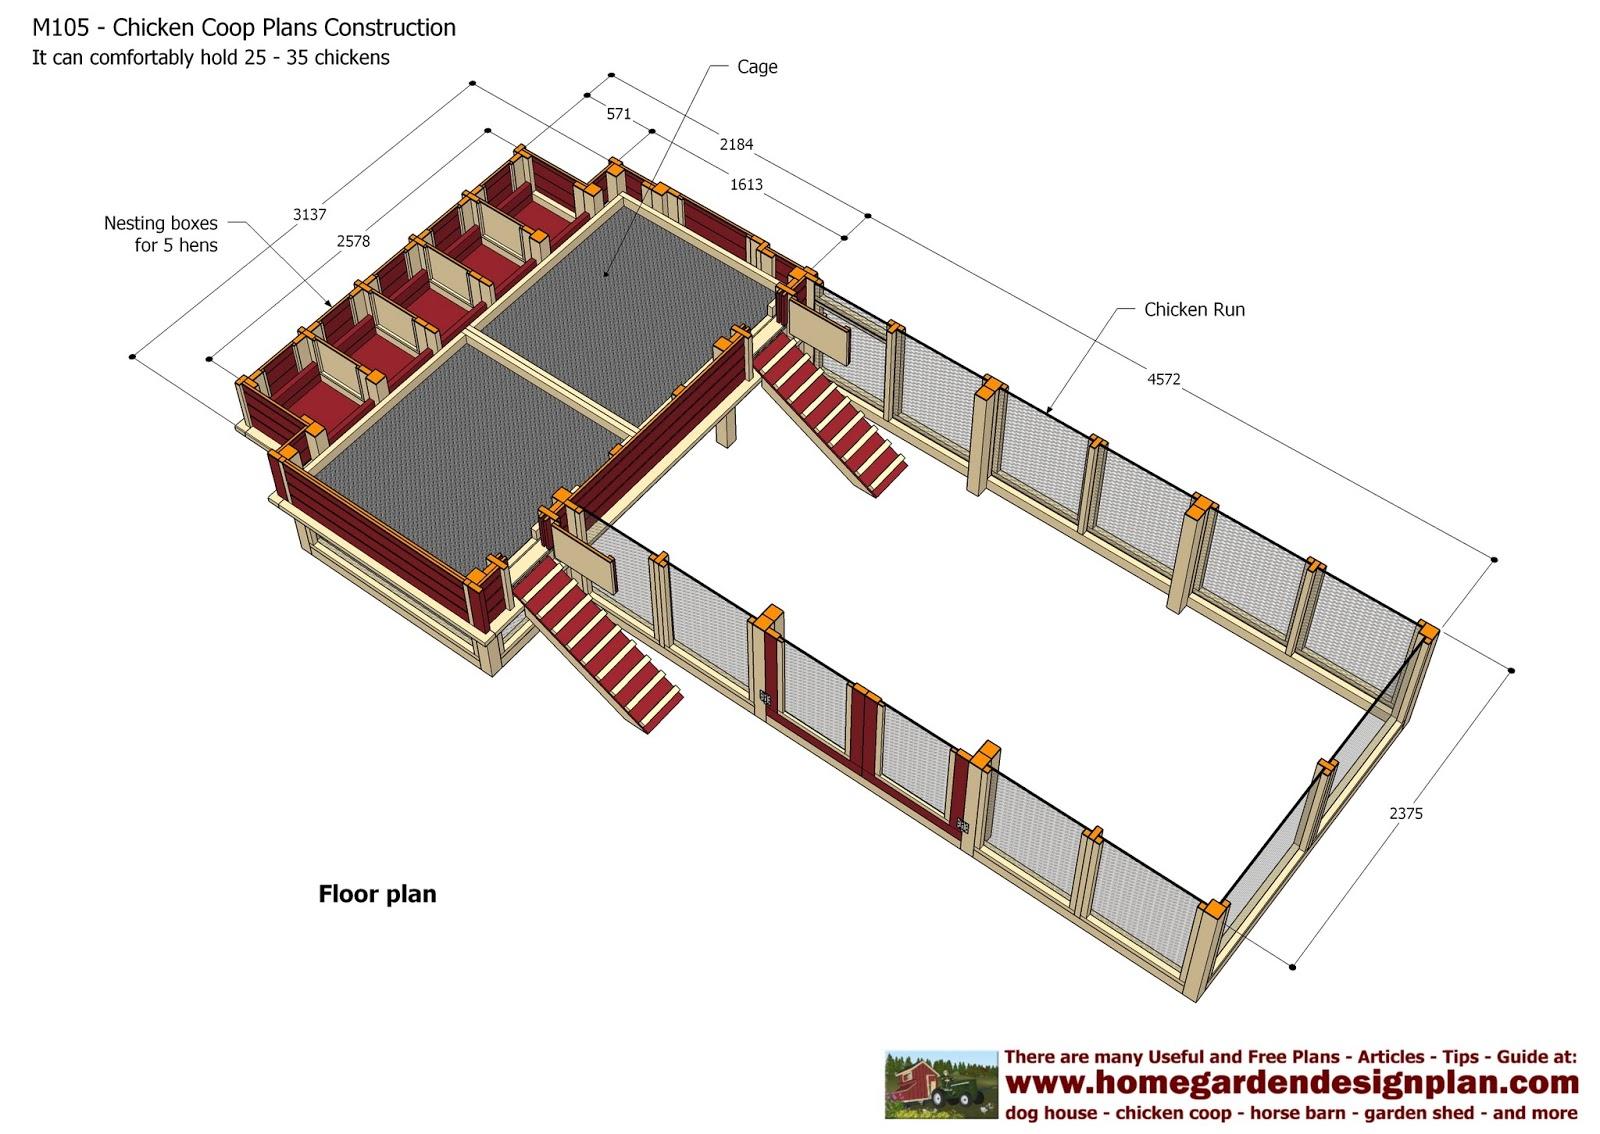 Home Garden Plans M105 Chicken Coop Plans Construction